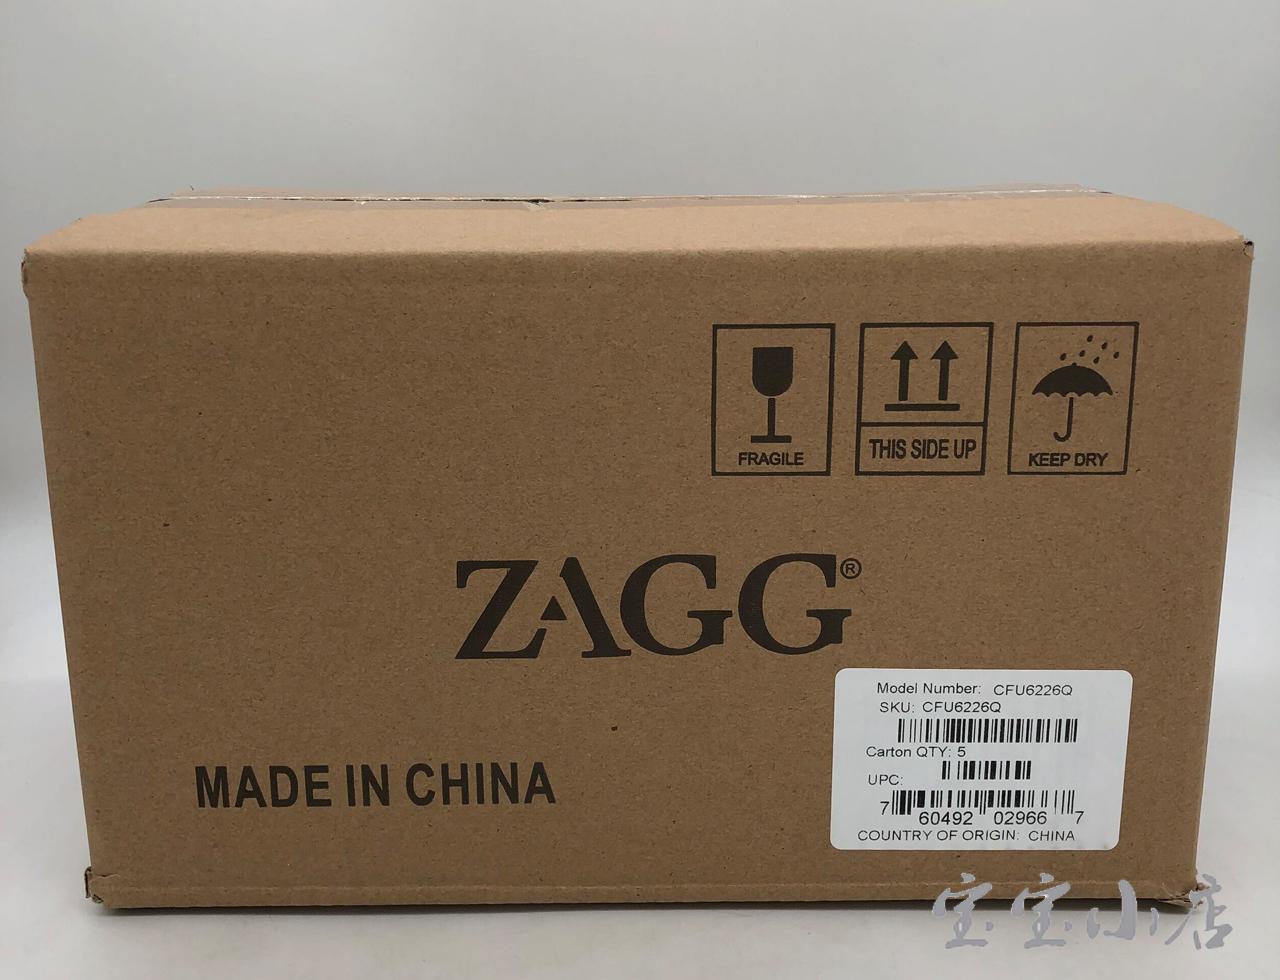 ZAGG电脑平板蓝牙键盘清洁防尘静音办公专用打字小型便携无线游戏键盘